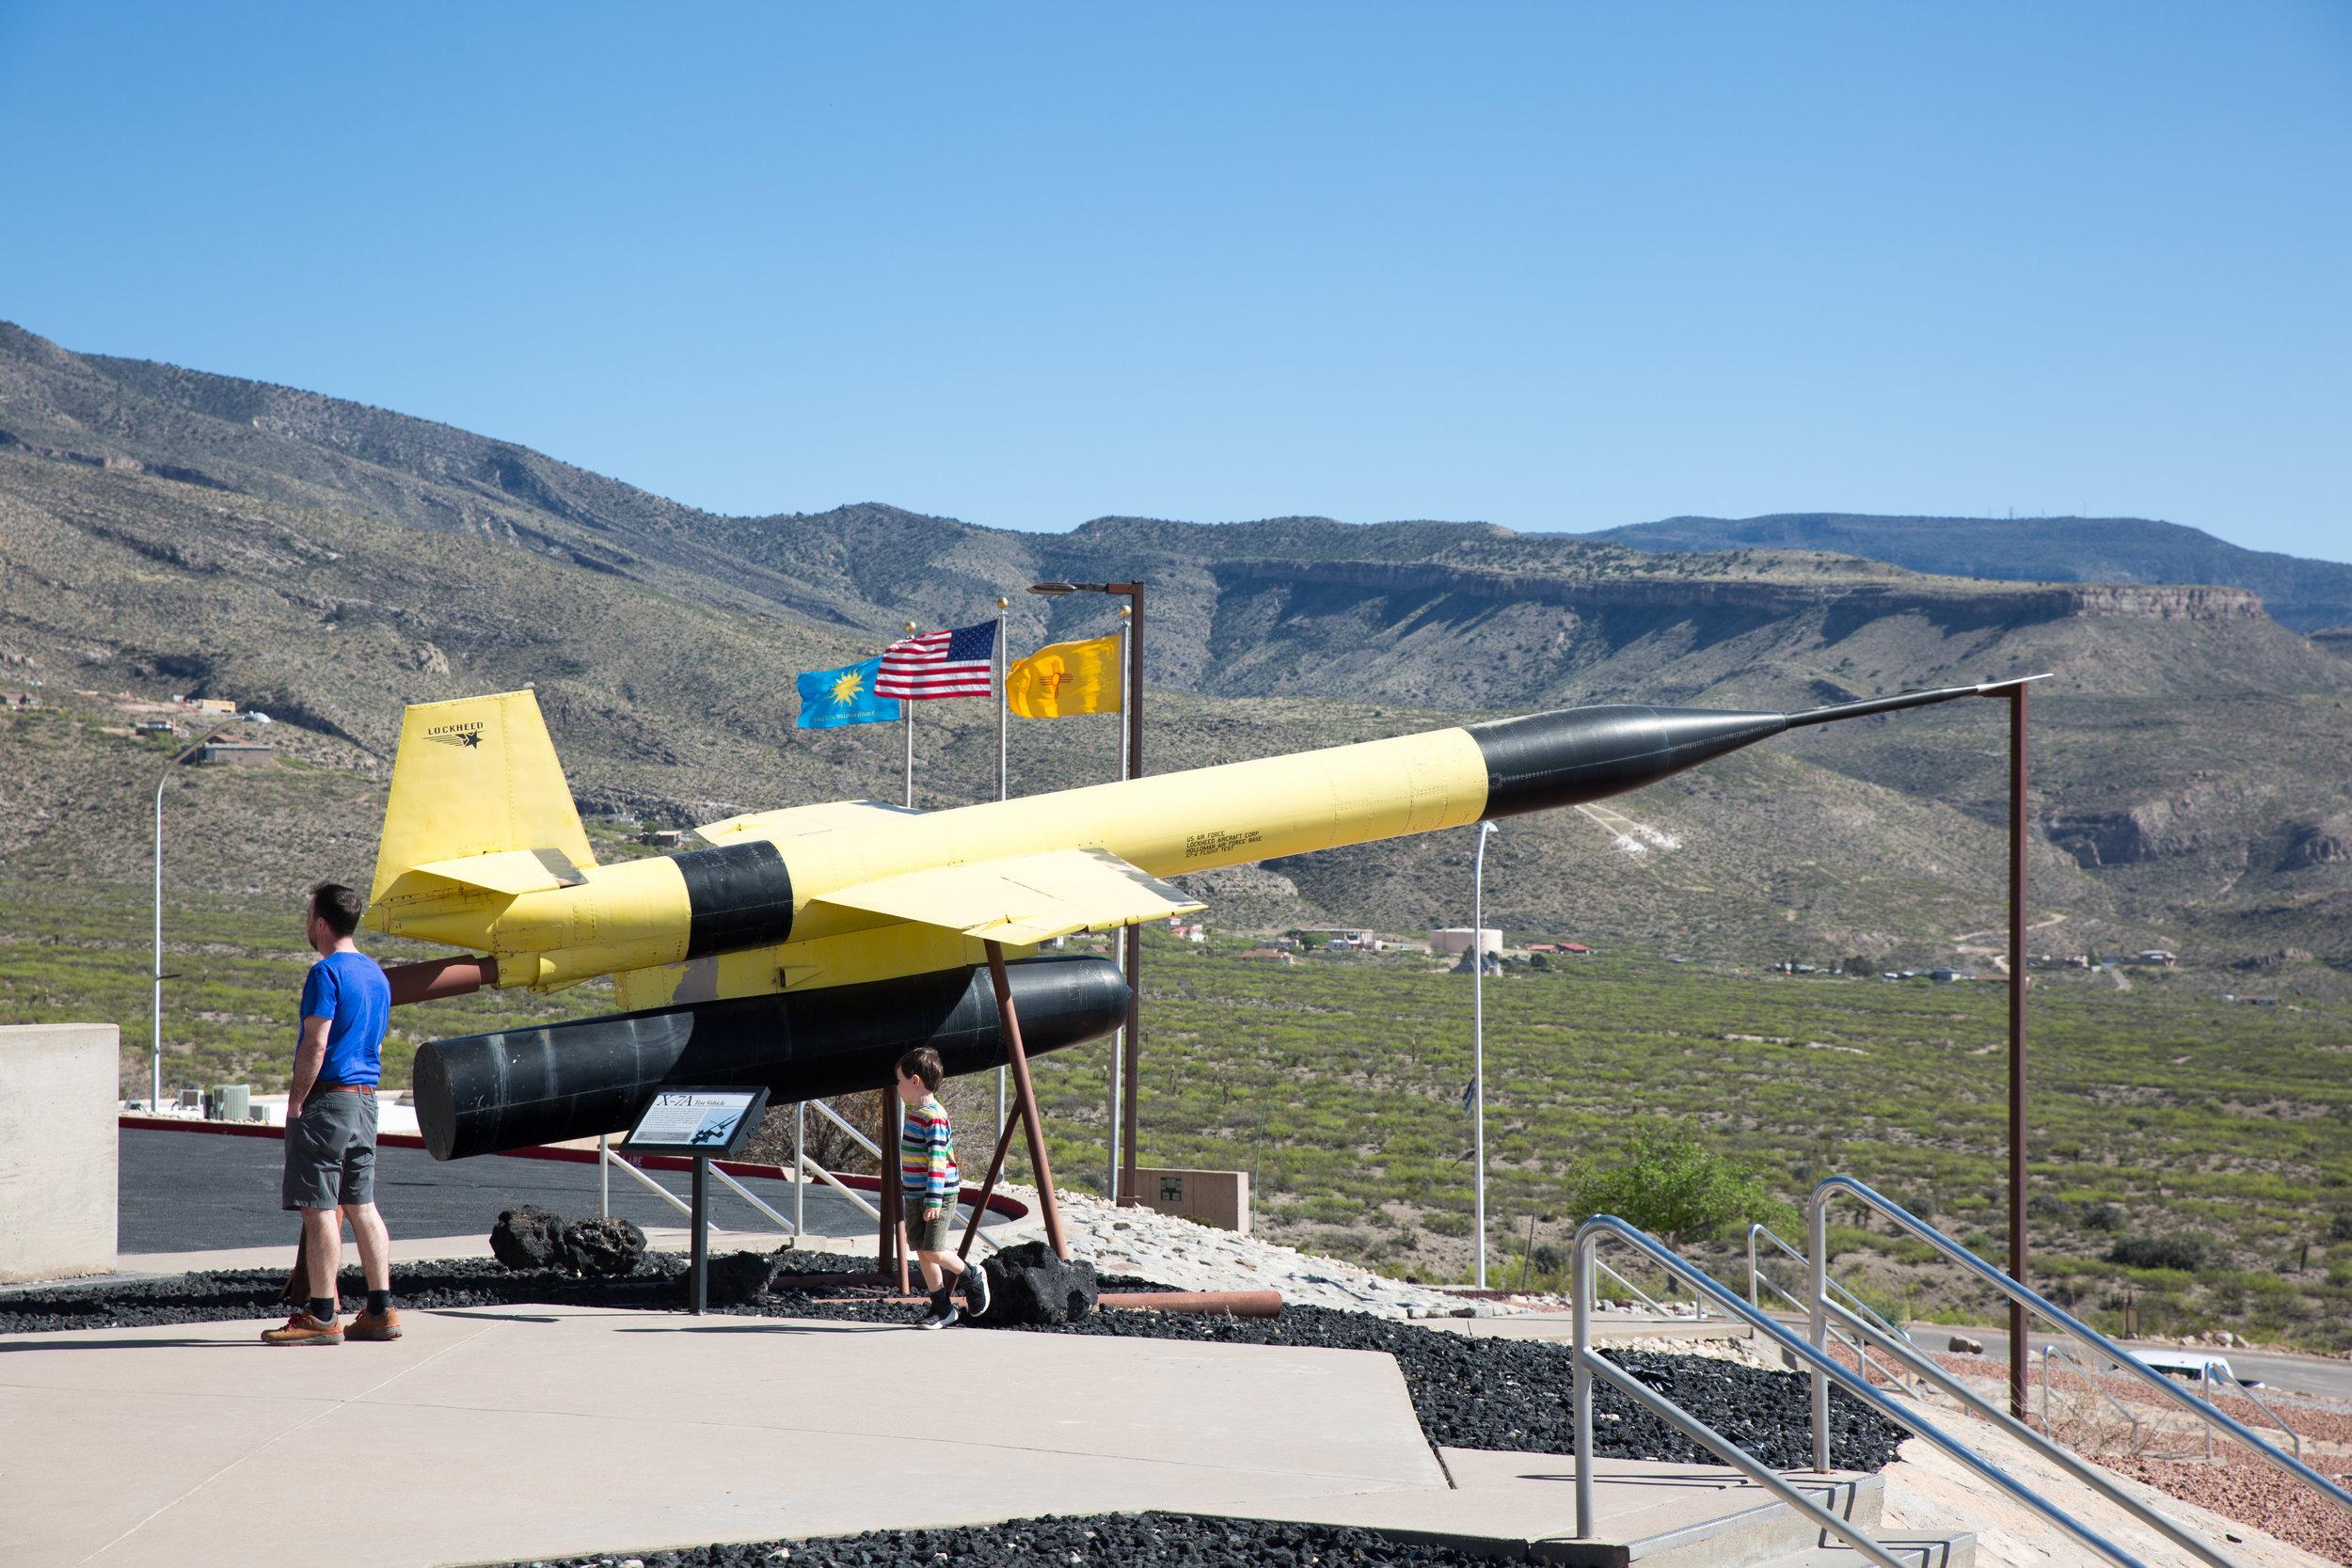 Space Museum in Alamogordo